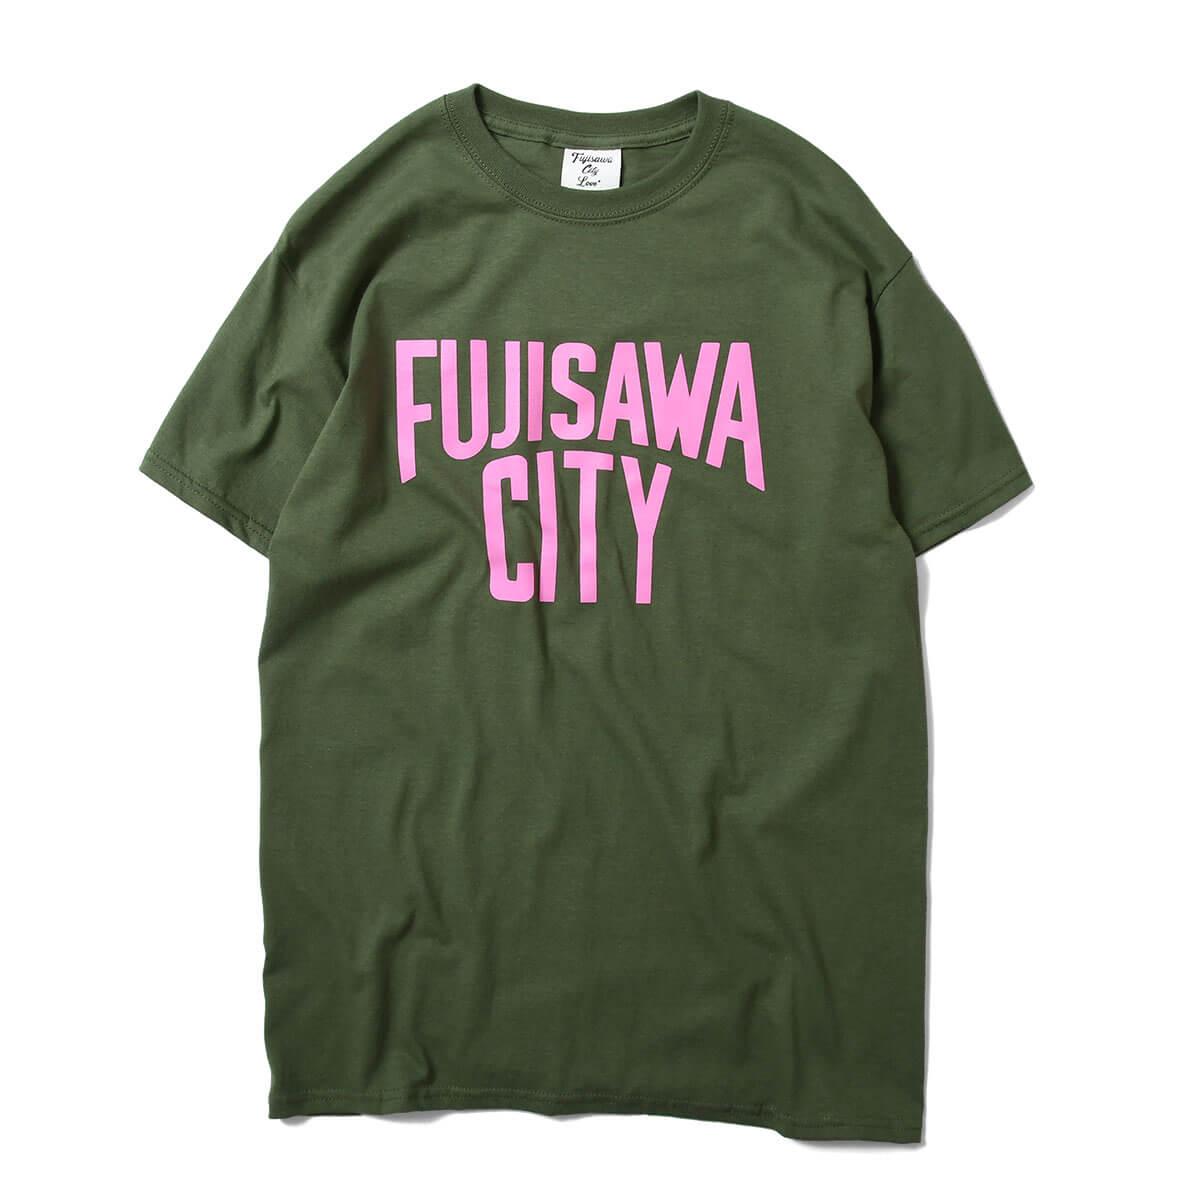 FUJISAWA CITY フジサワシティ LOGO TEE 半袖 Tシャツ GREEN/PINK グリーン/ピンク